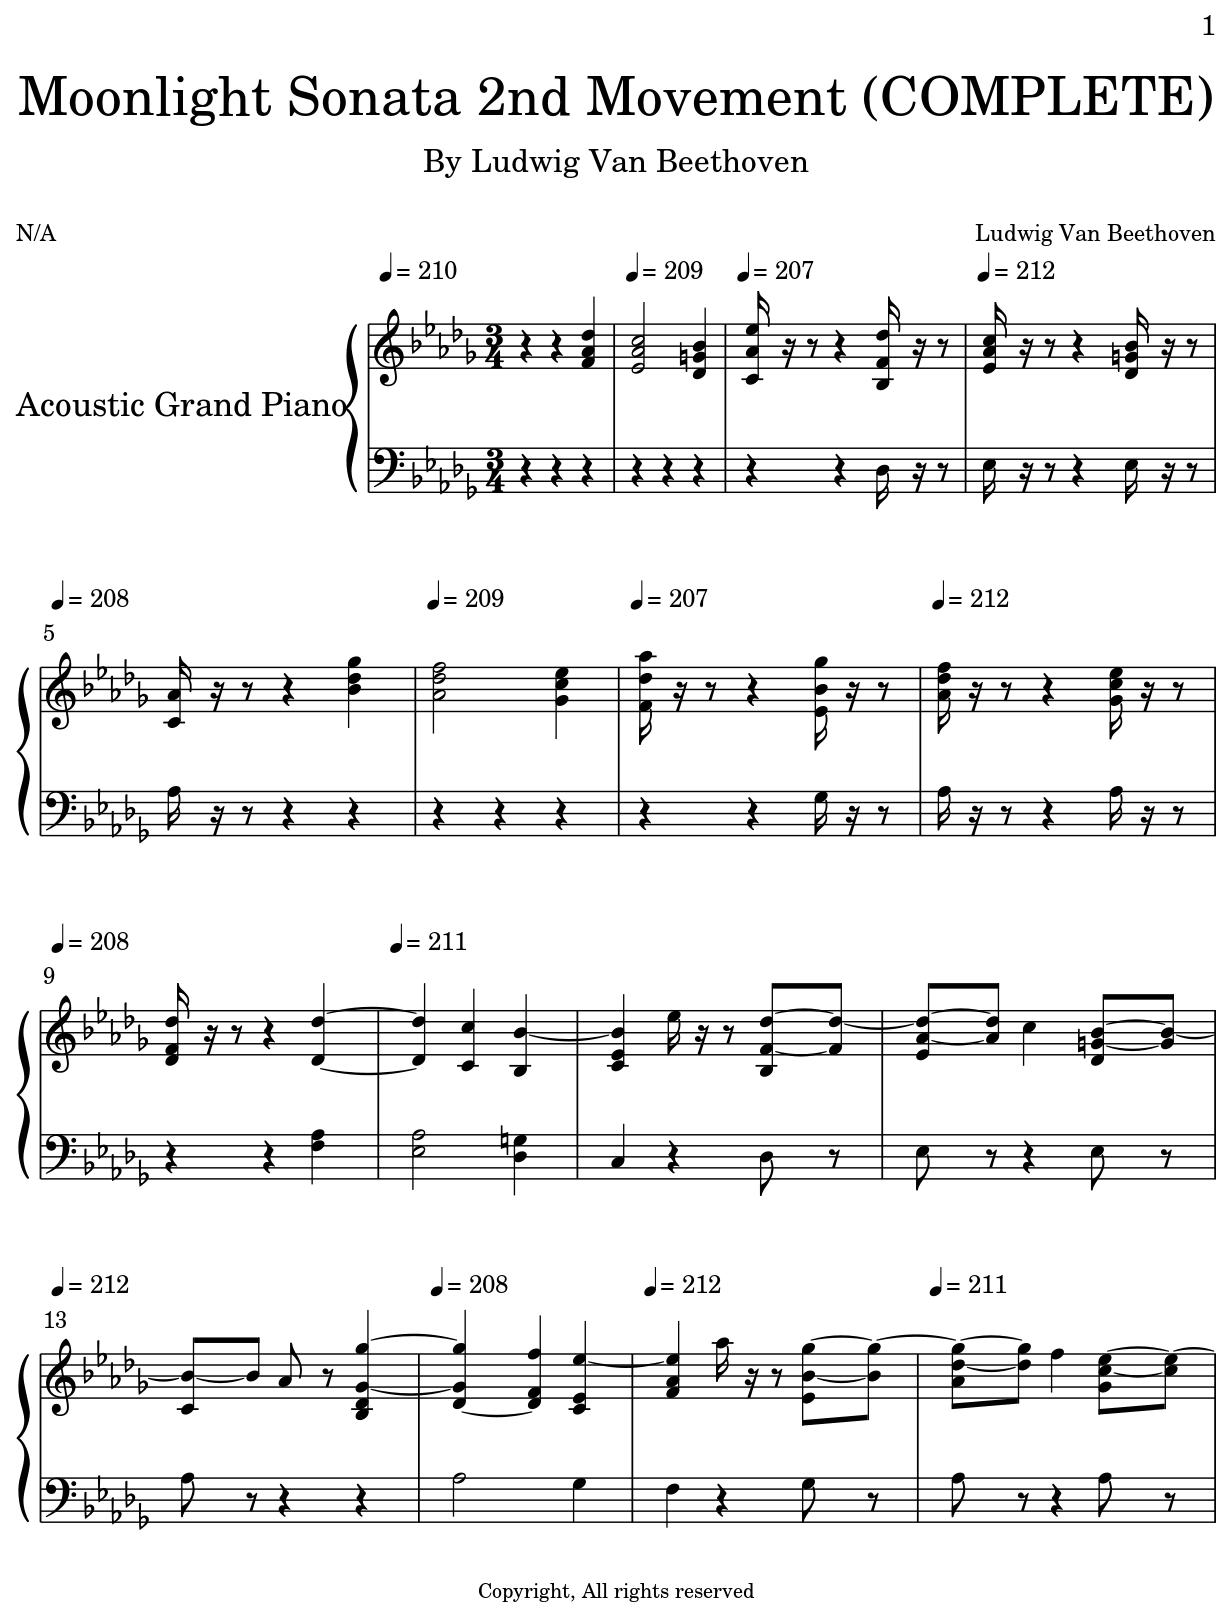 Moonlight Sonata 2nd Movement (COMPLETE) - Flat